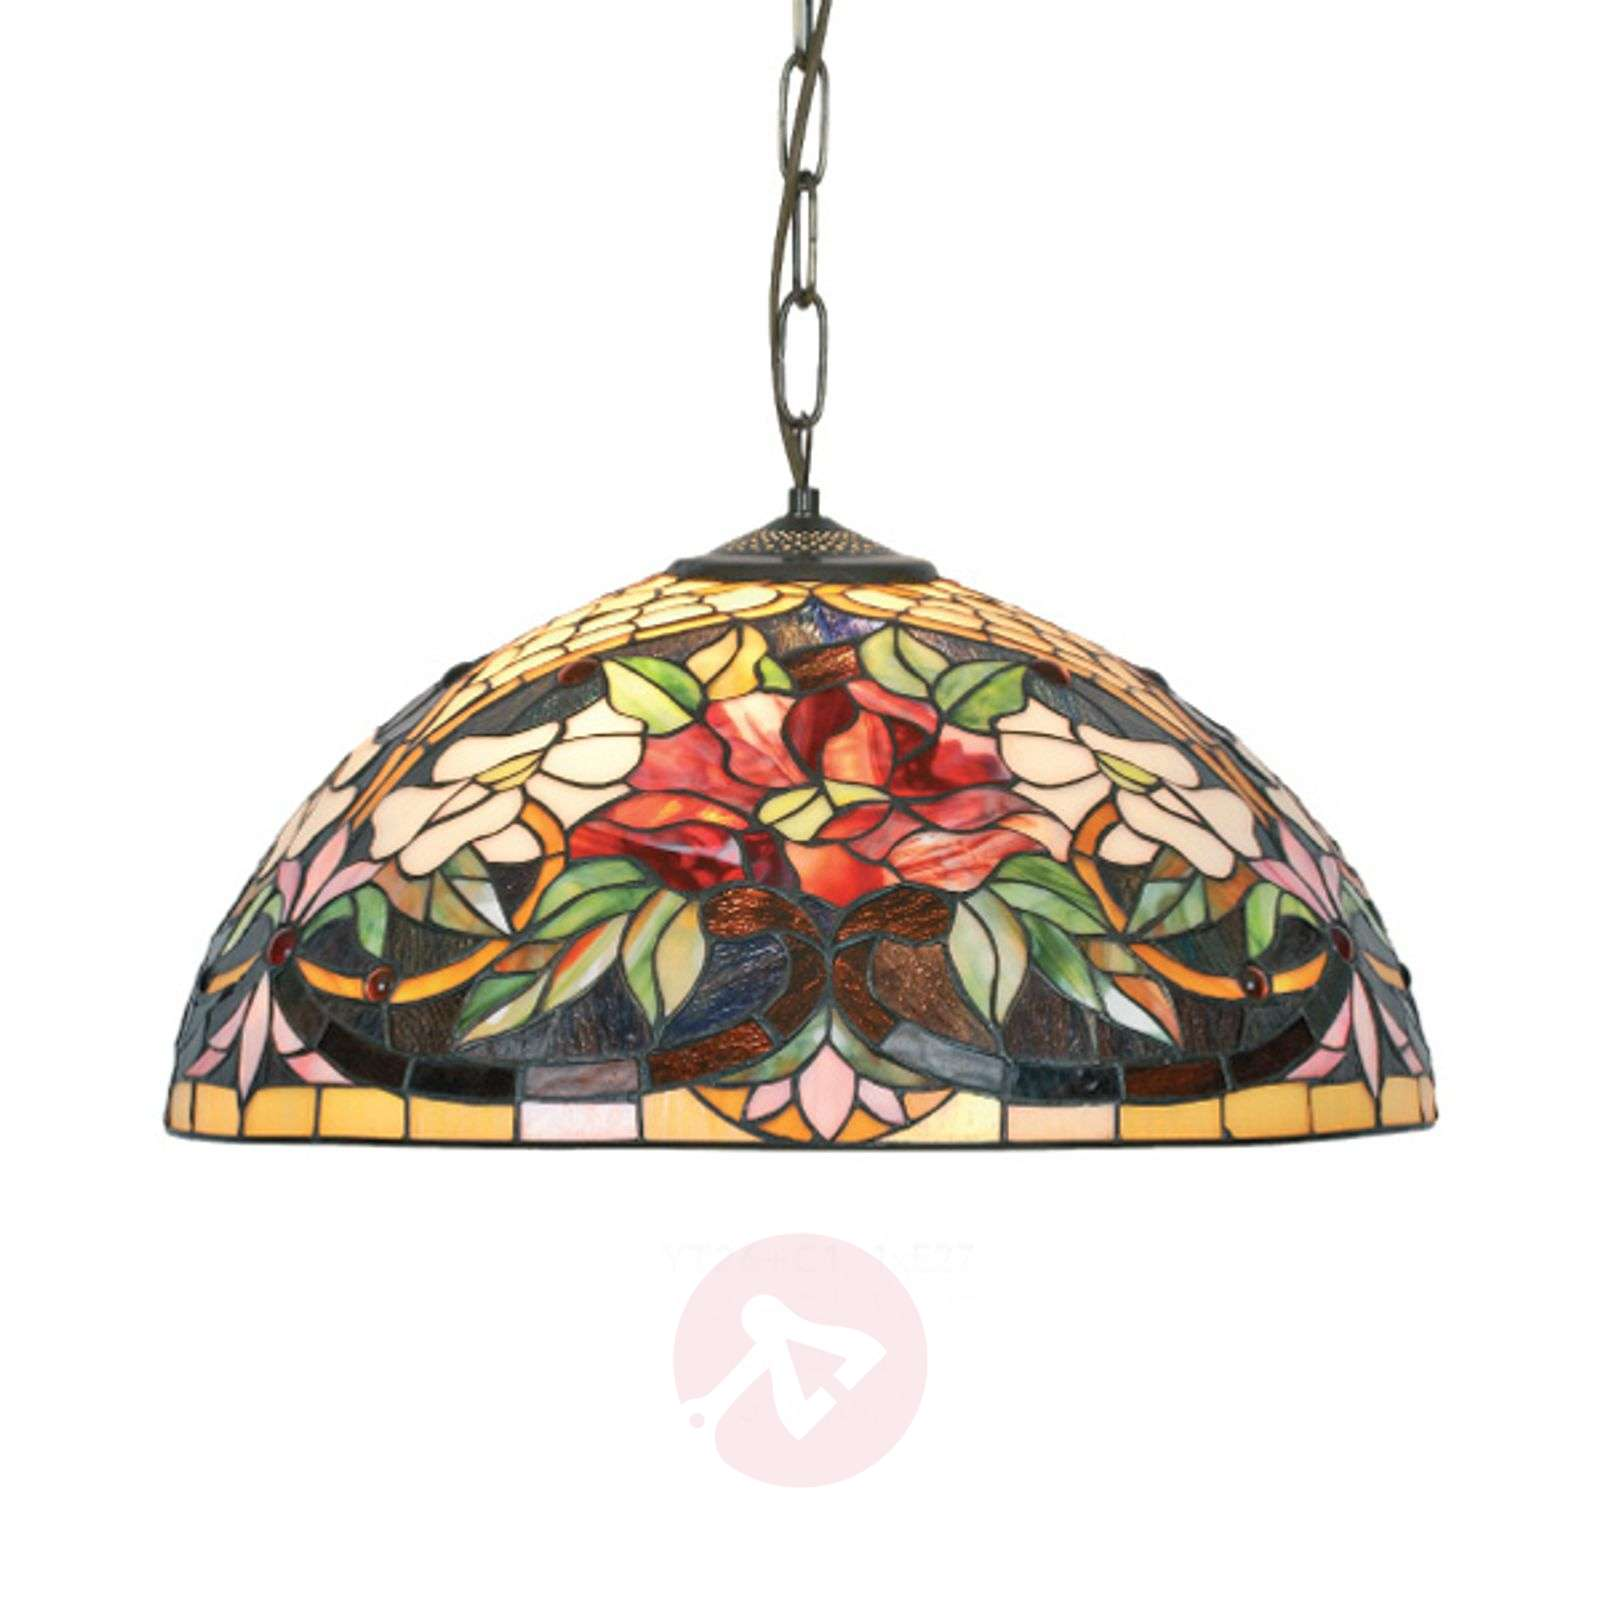 Tiffany-style hanging light Ariadne-1032148X-01